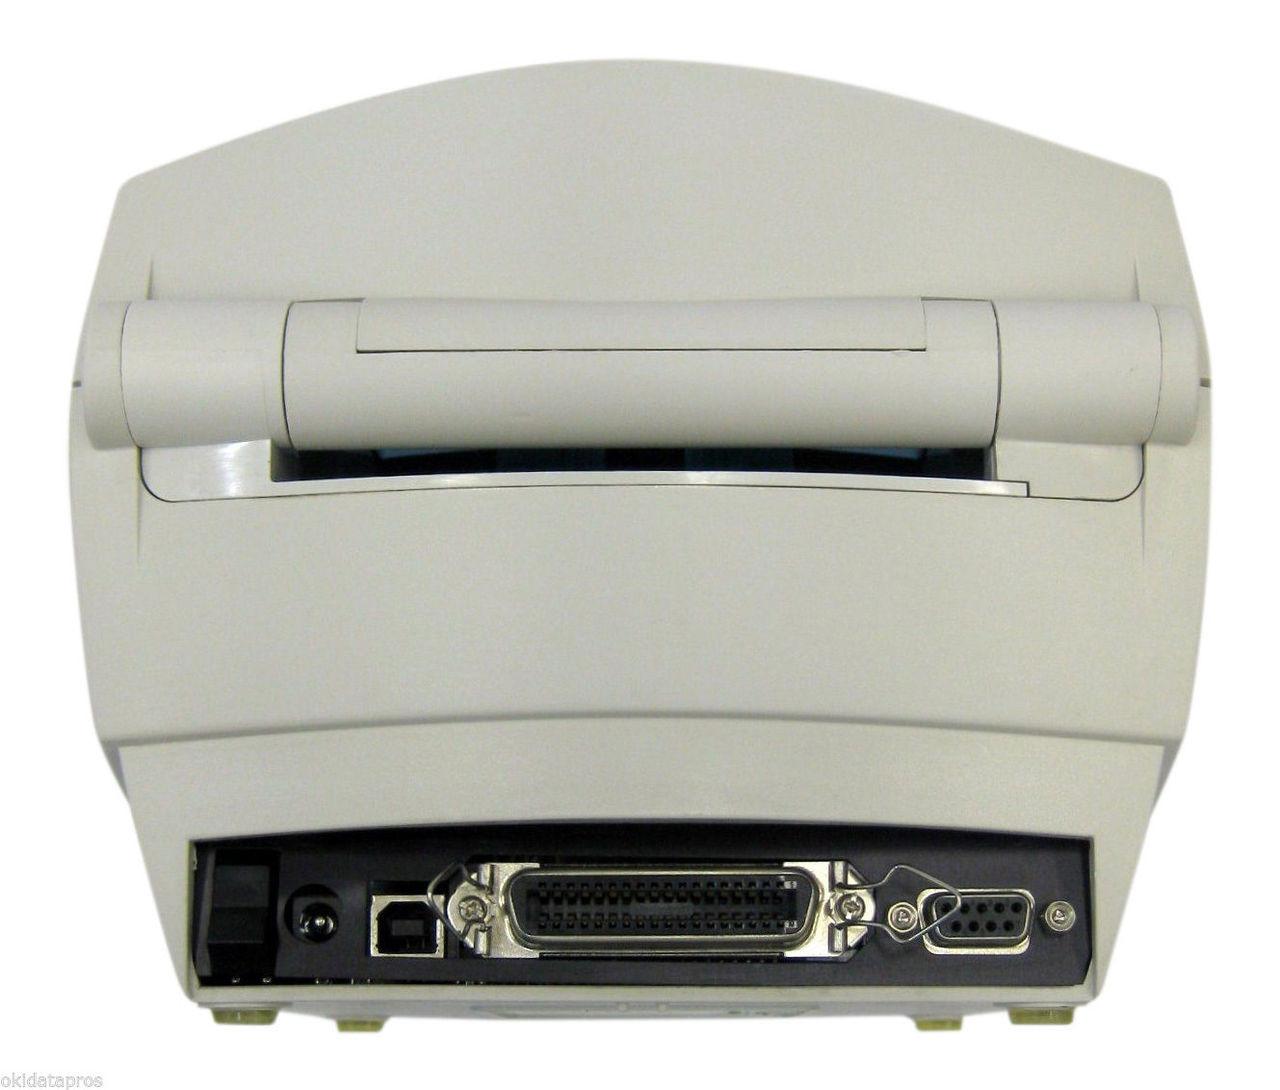 Zebra 2844 printer driver for windows mac.